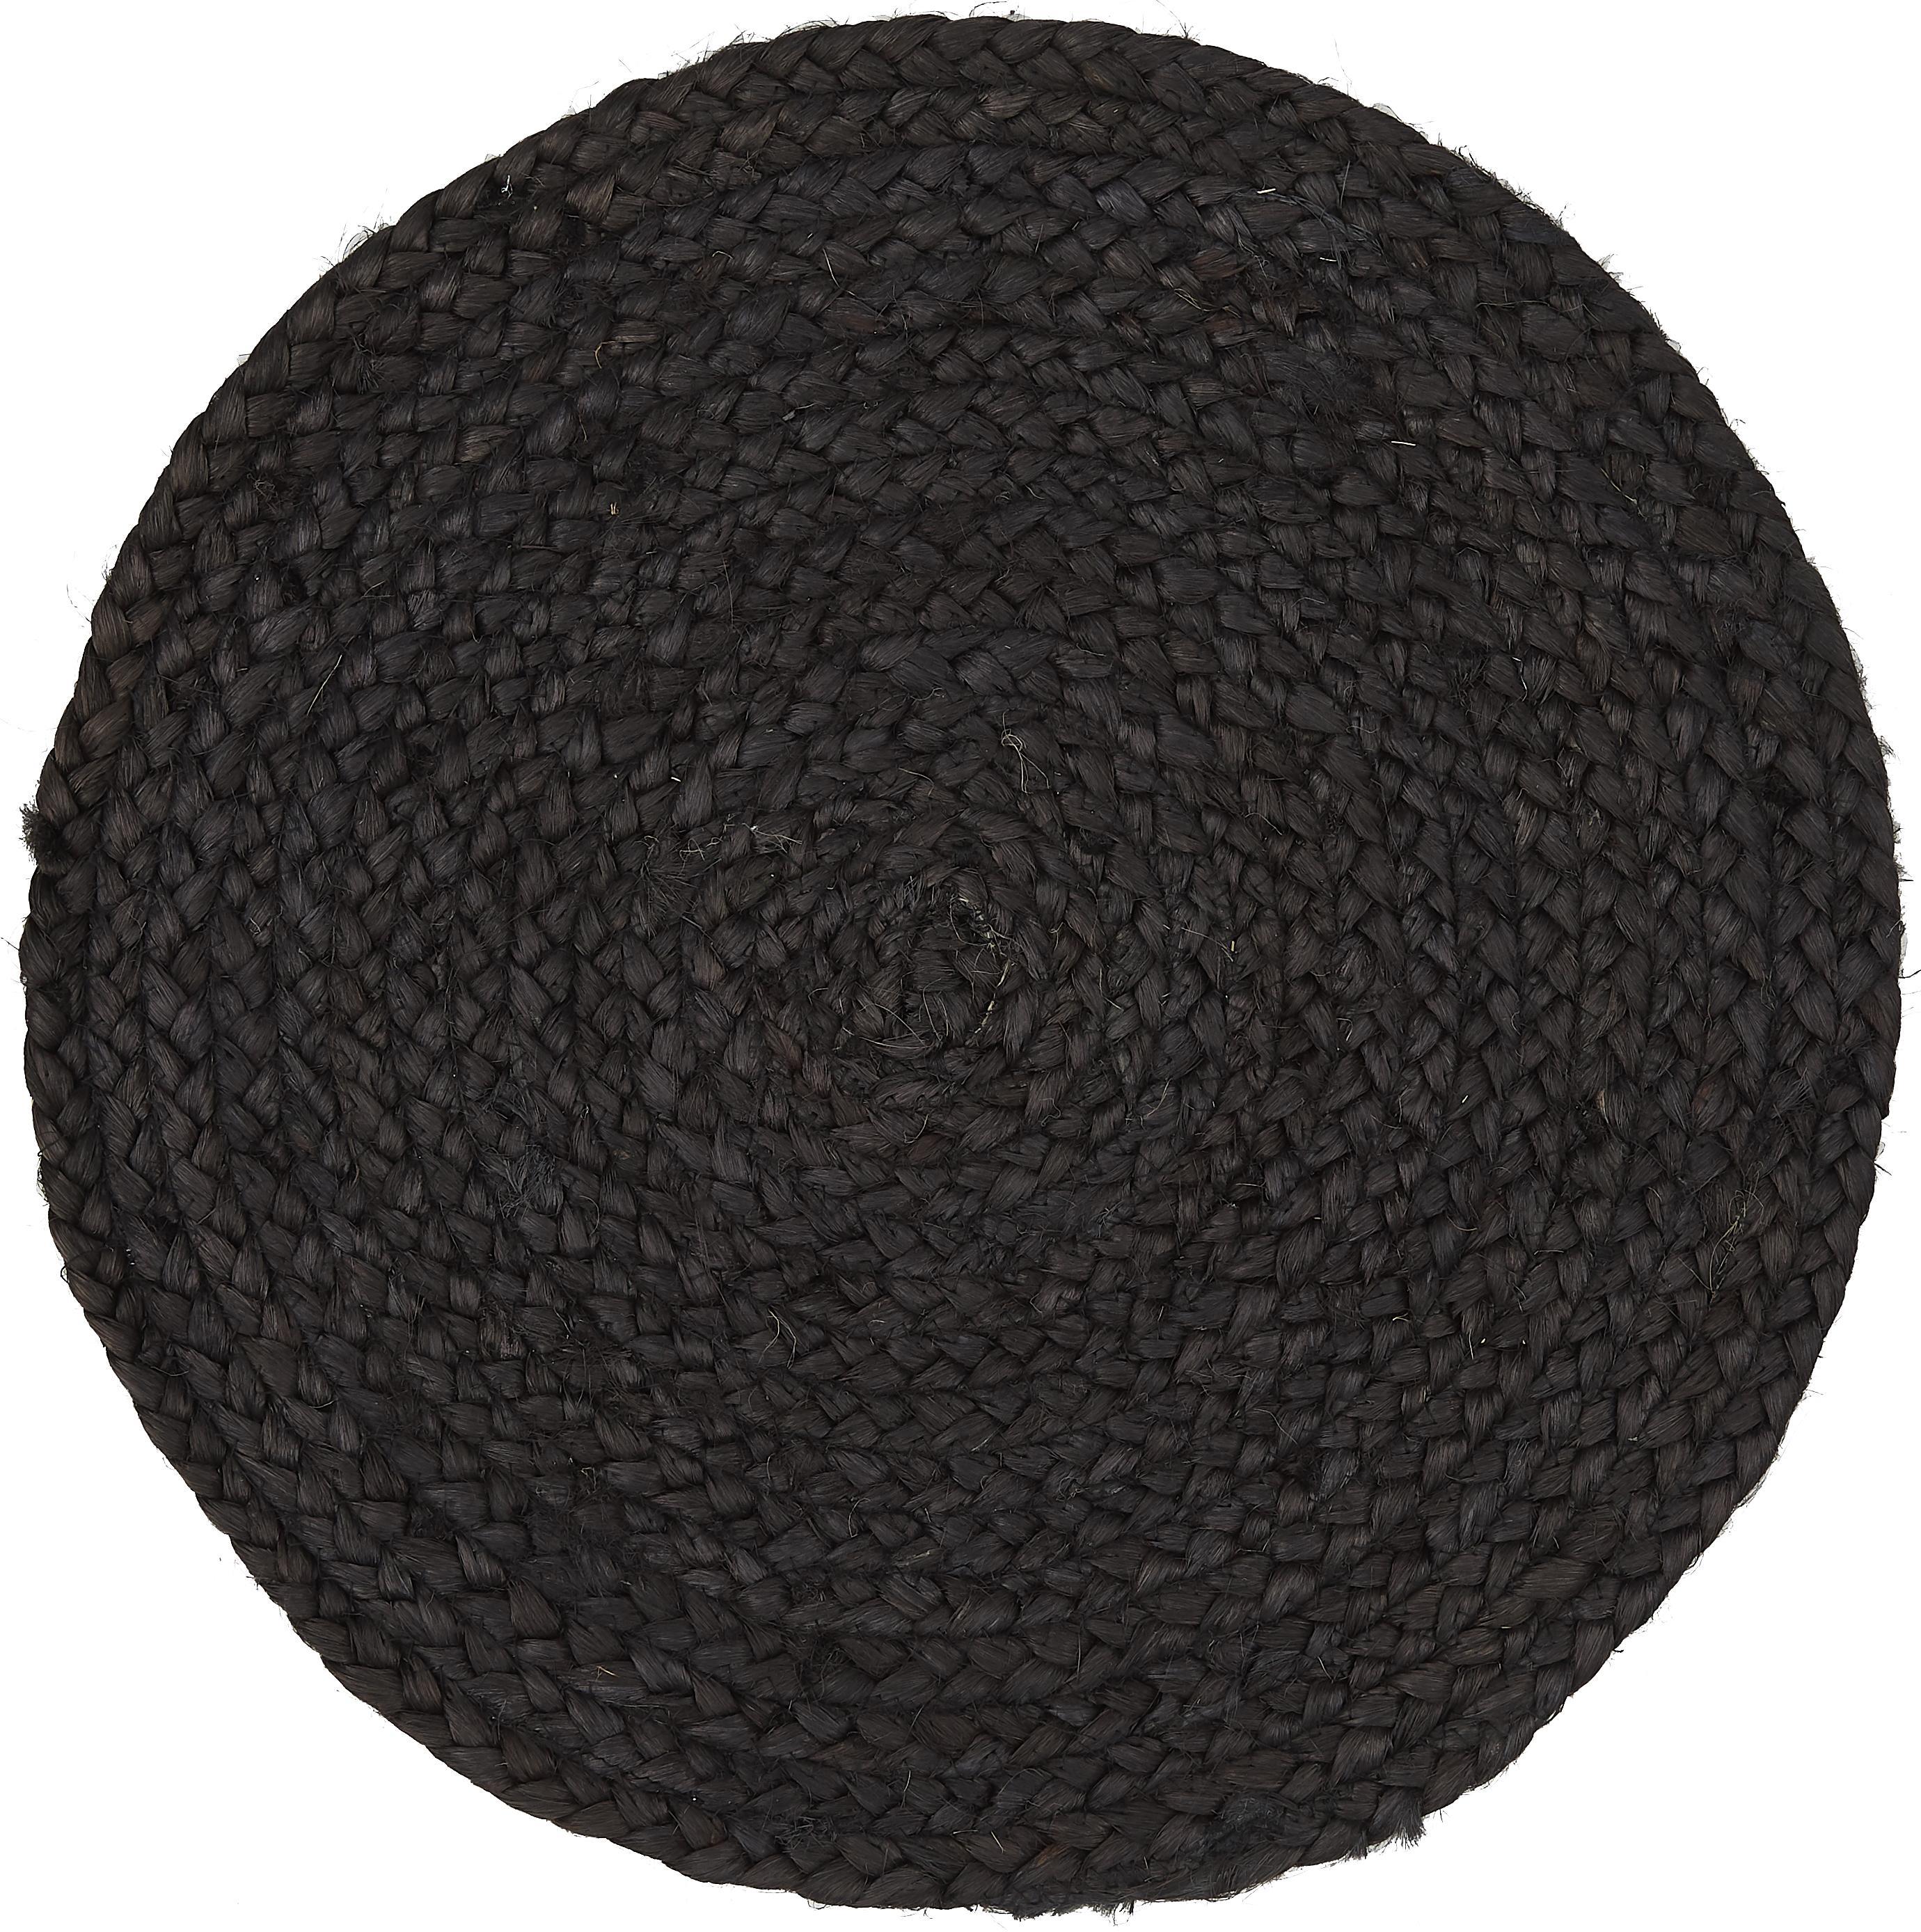 Ronde jute placemats Thrill, 4 stuks, Gekleurd jute, Zwart, Ø 35 cm